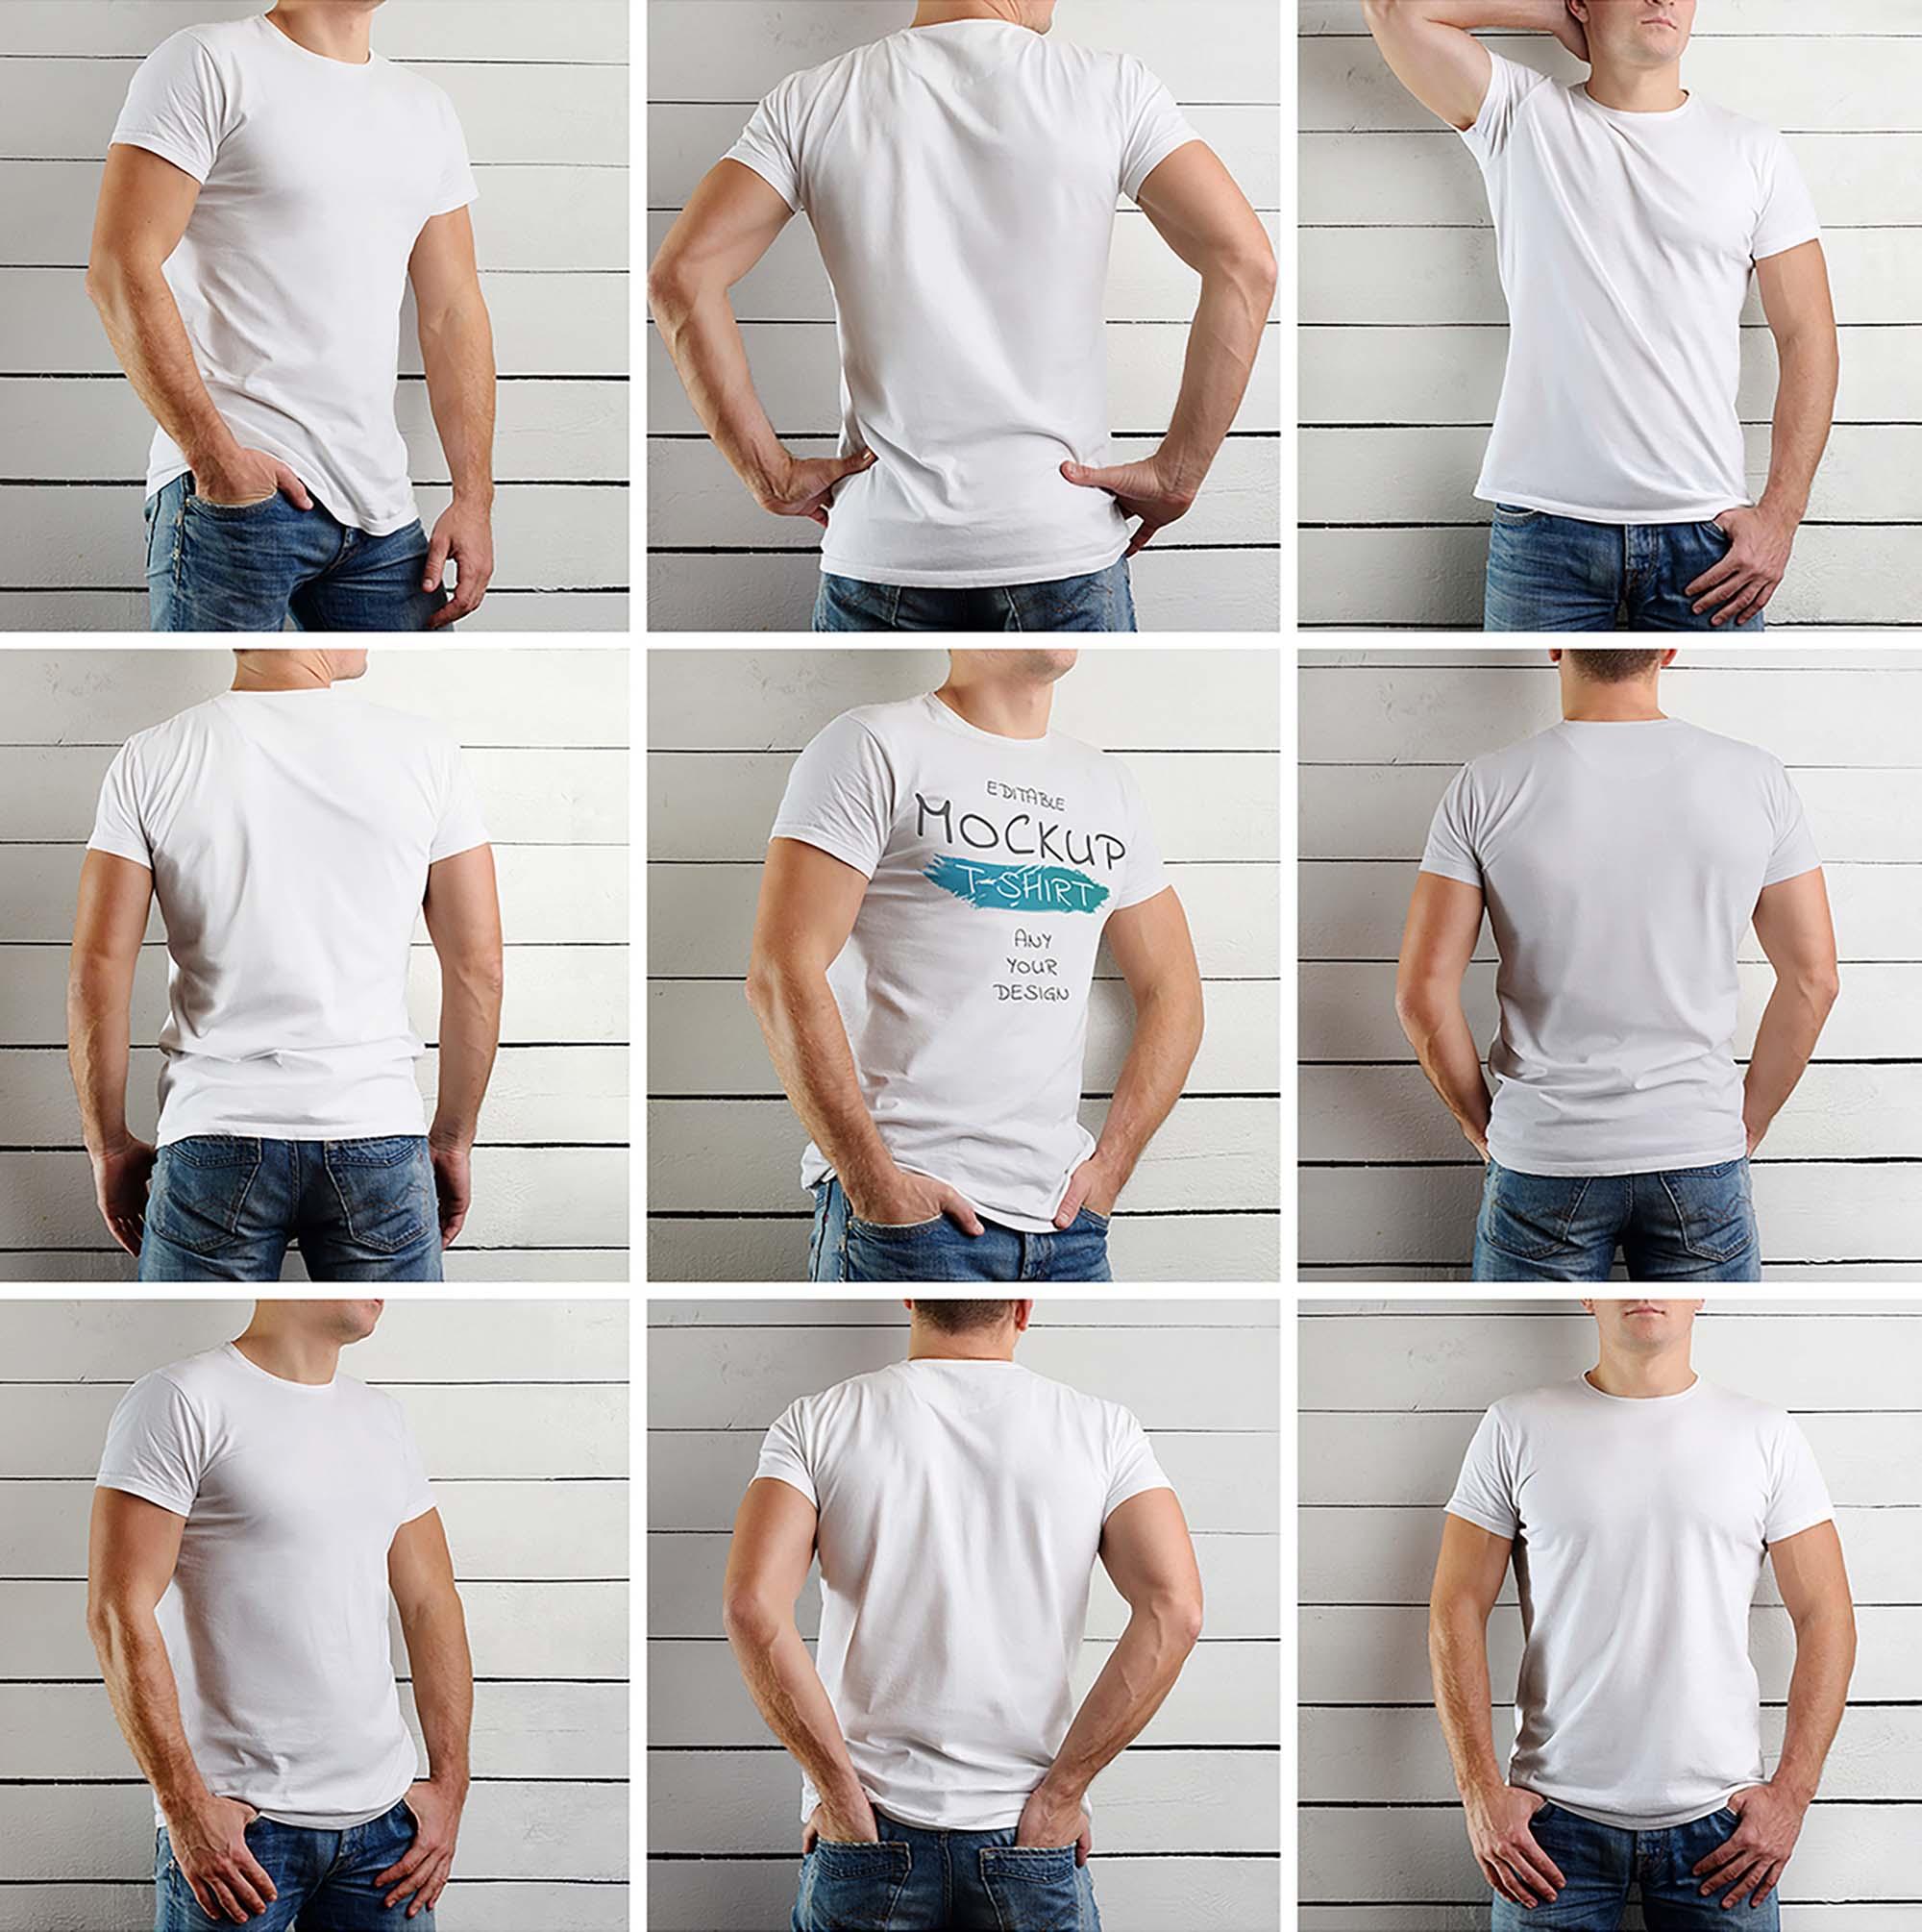 9 Athletic Man Wearing T-Shirt Mockups